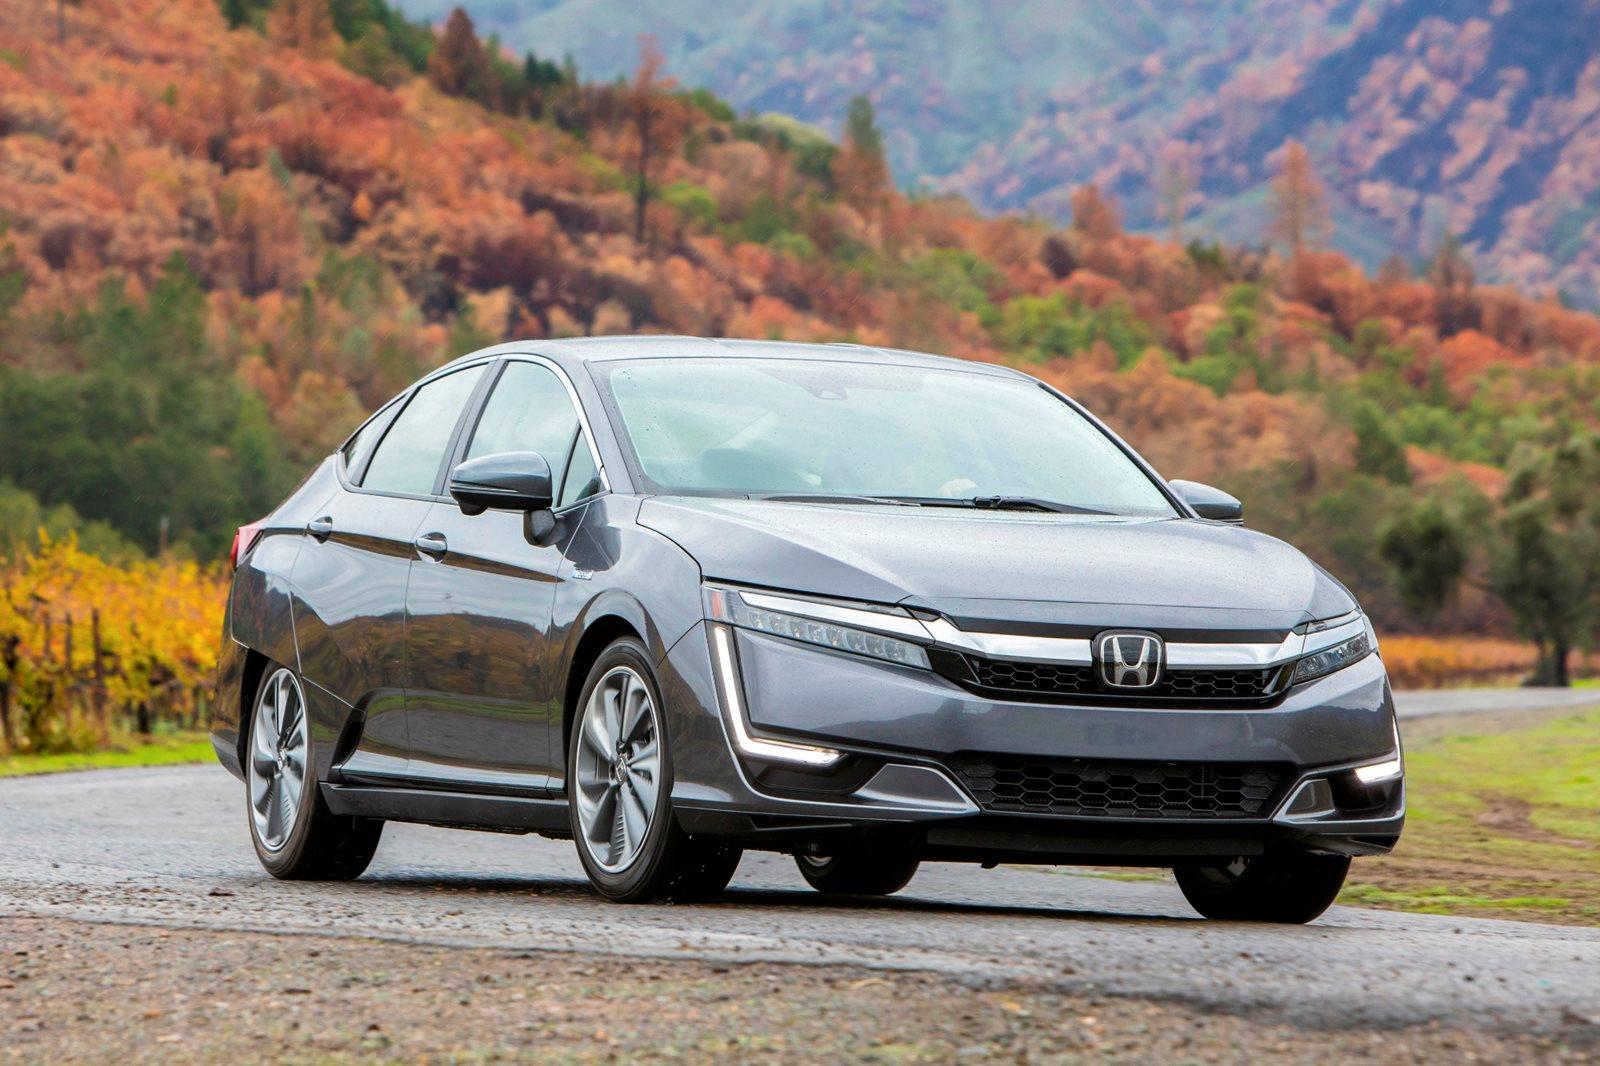 2021 honda clarity plug-in hybrid: review, trims, specs